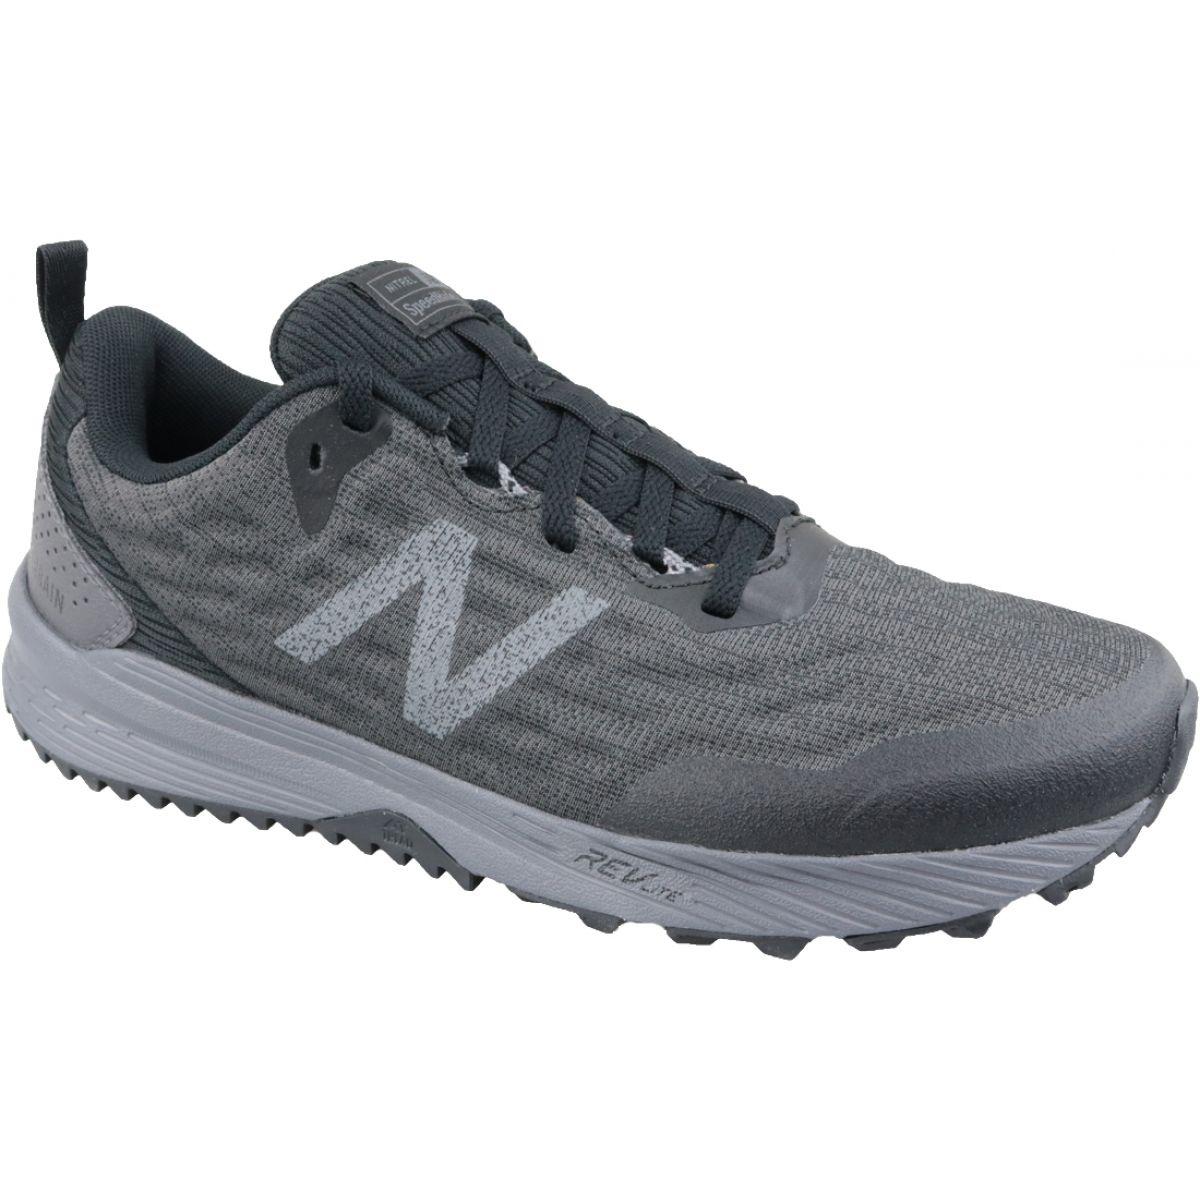 Zapatillas de hombre New Balance FuelCore NITREL Trail